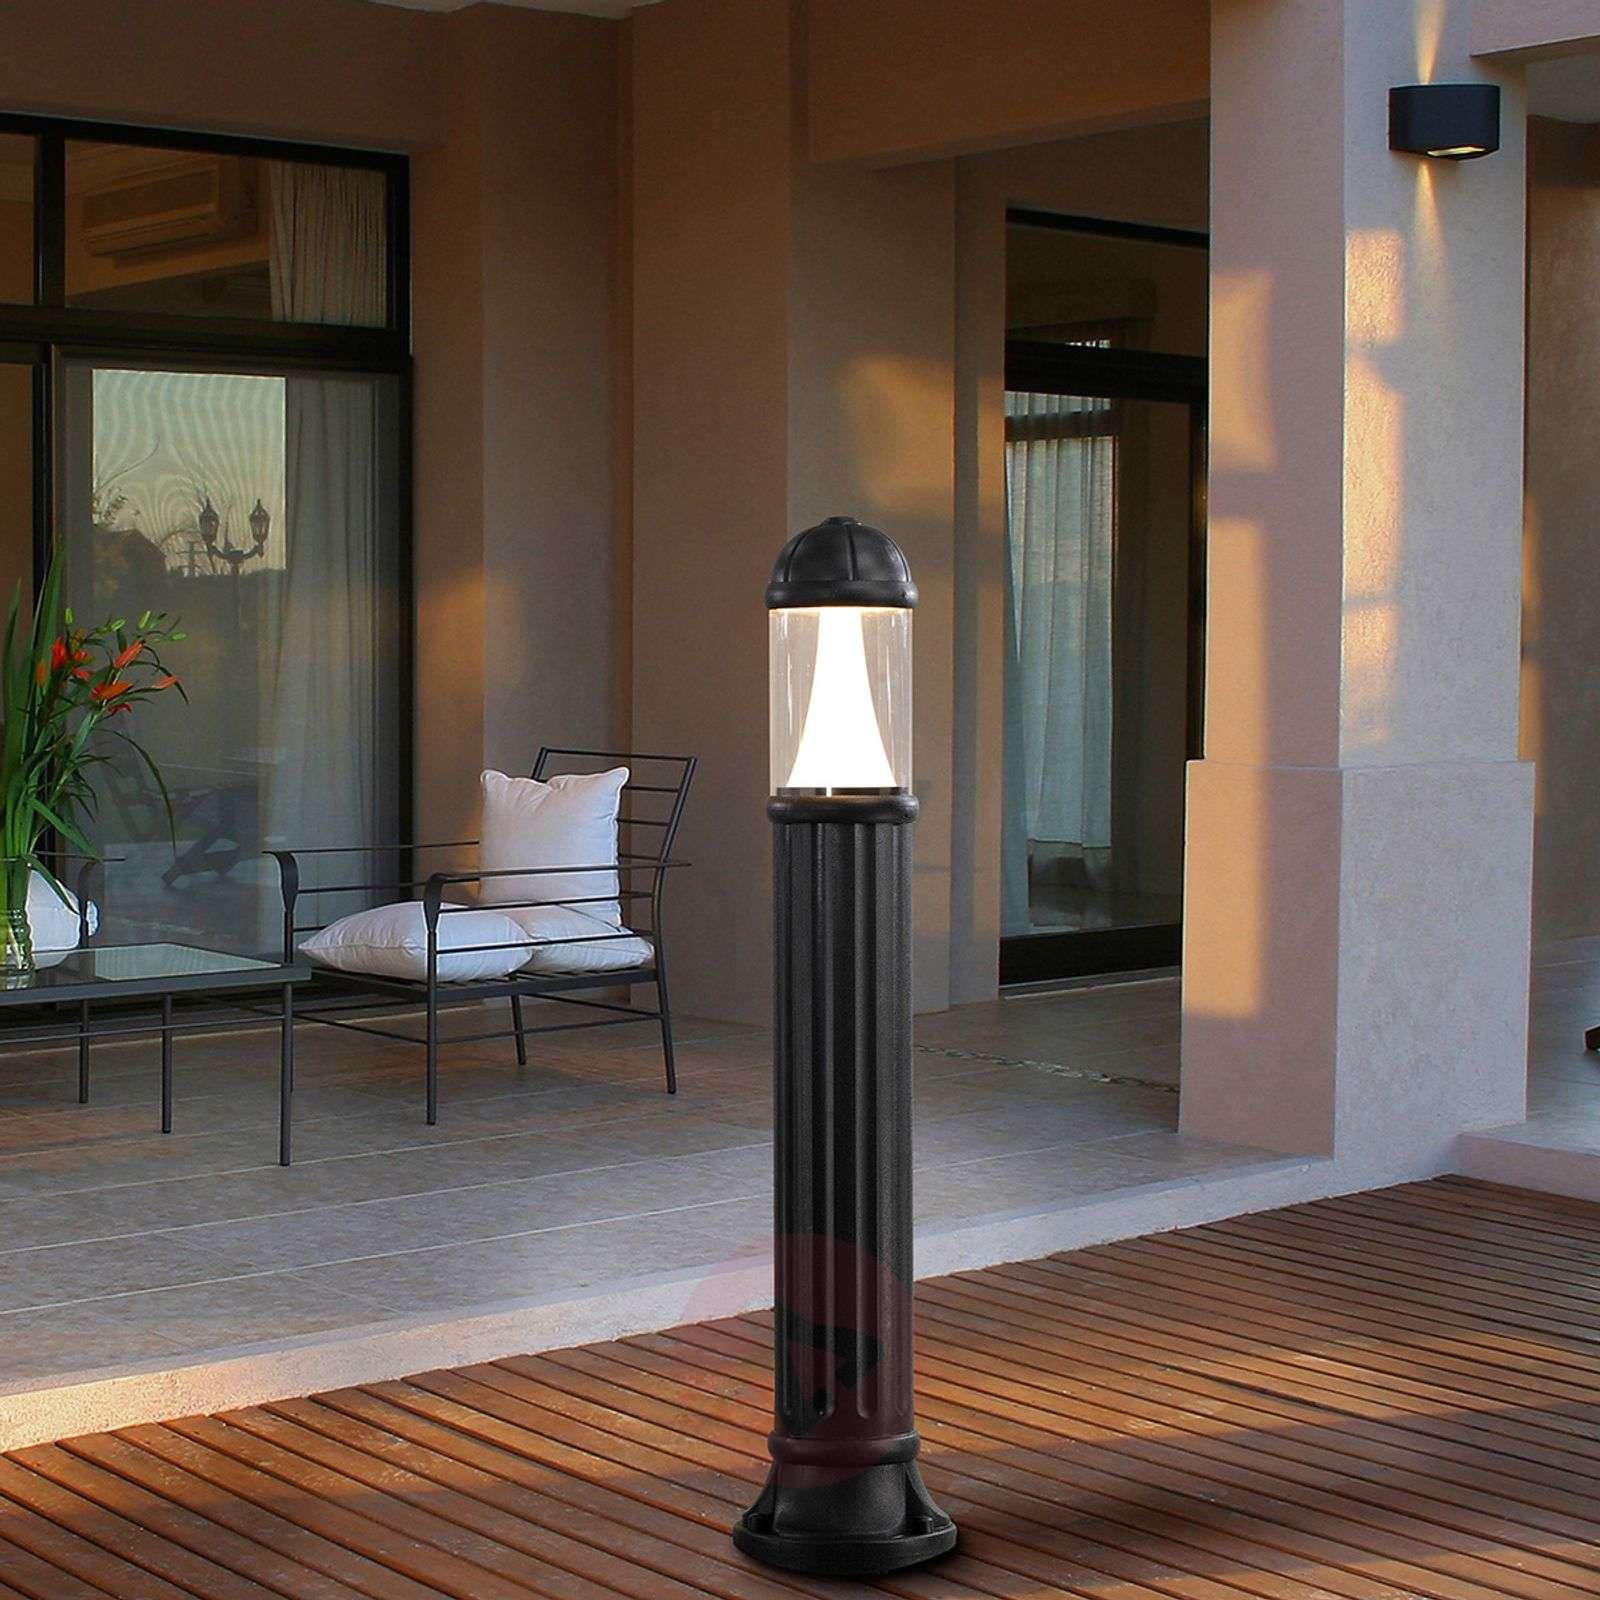 Sauro 1100 LED path light IP55 impact resist. ww.-3538025-01